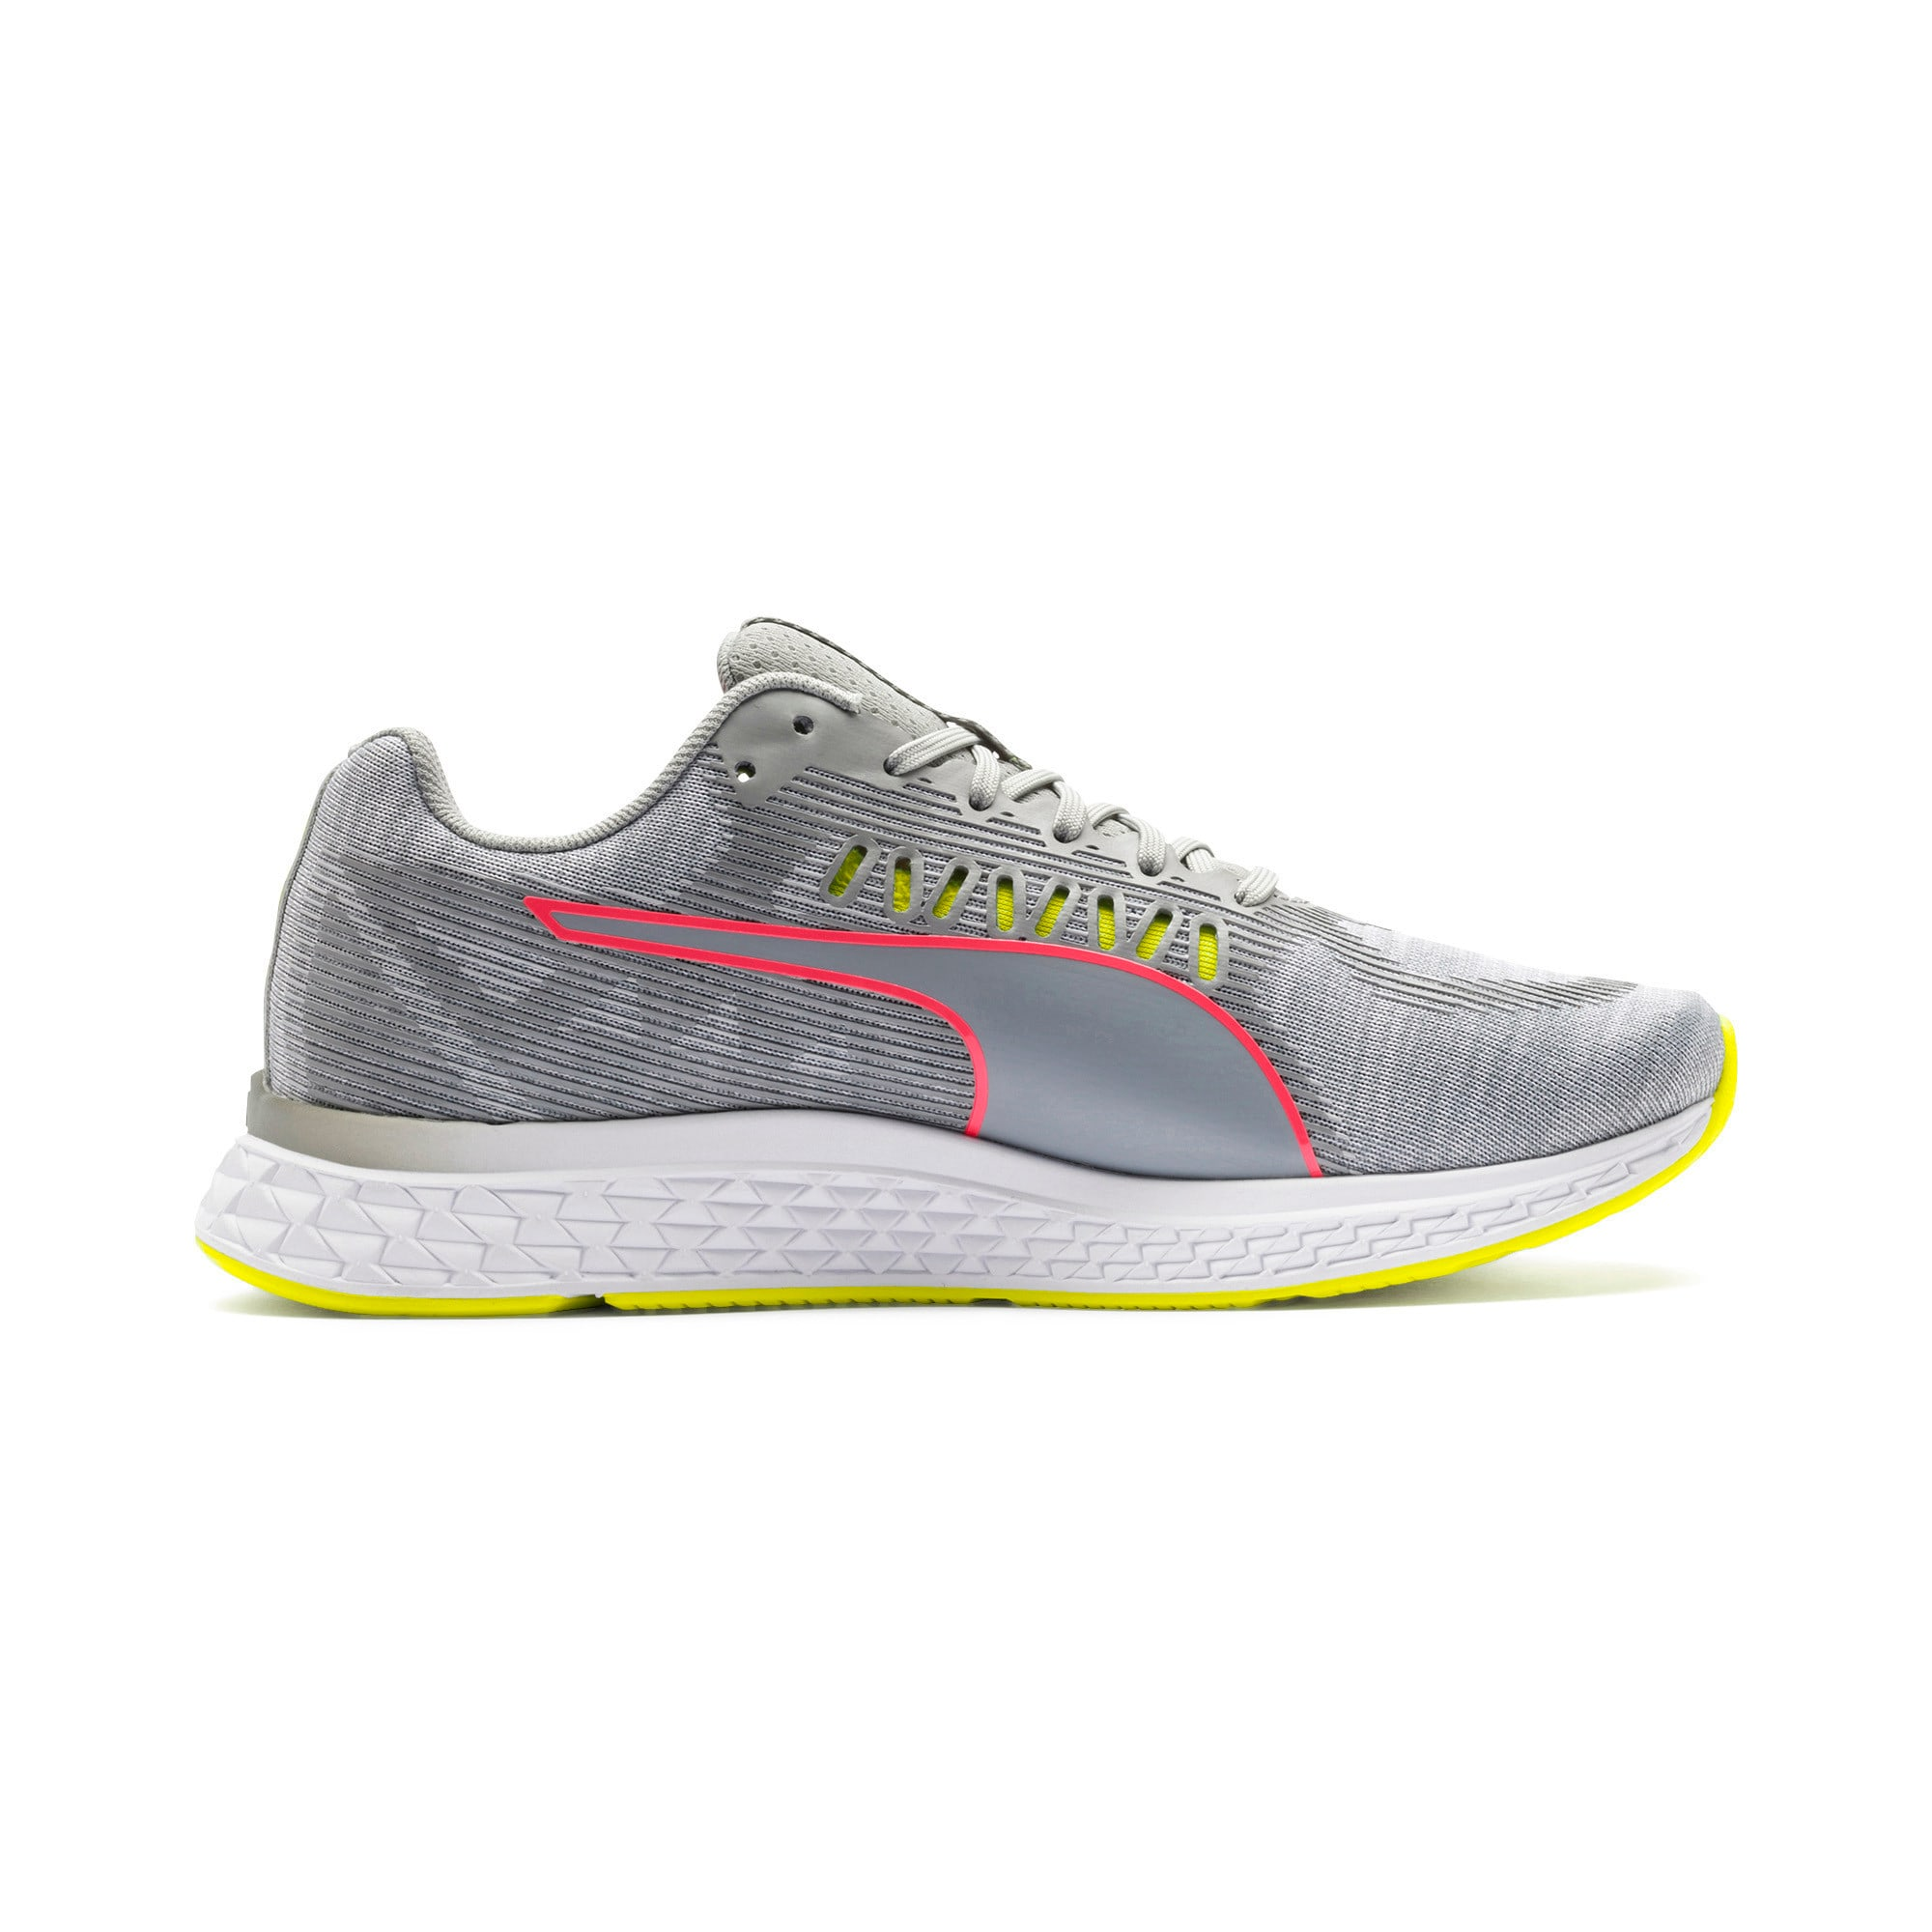 Thumbnail 5 of Speed Sutamina Women's Running Shoes, Quarry-Yellow Alert-Pink, medium-IND